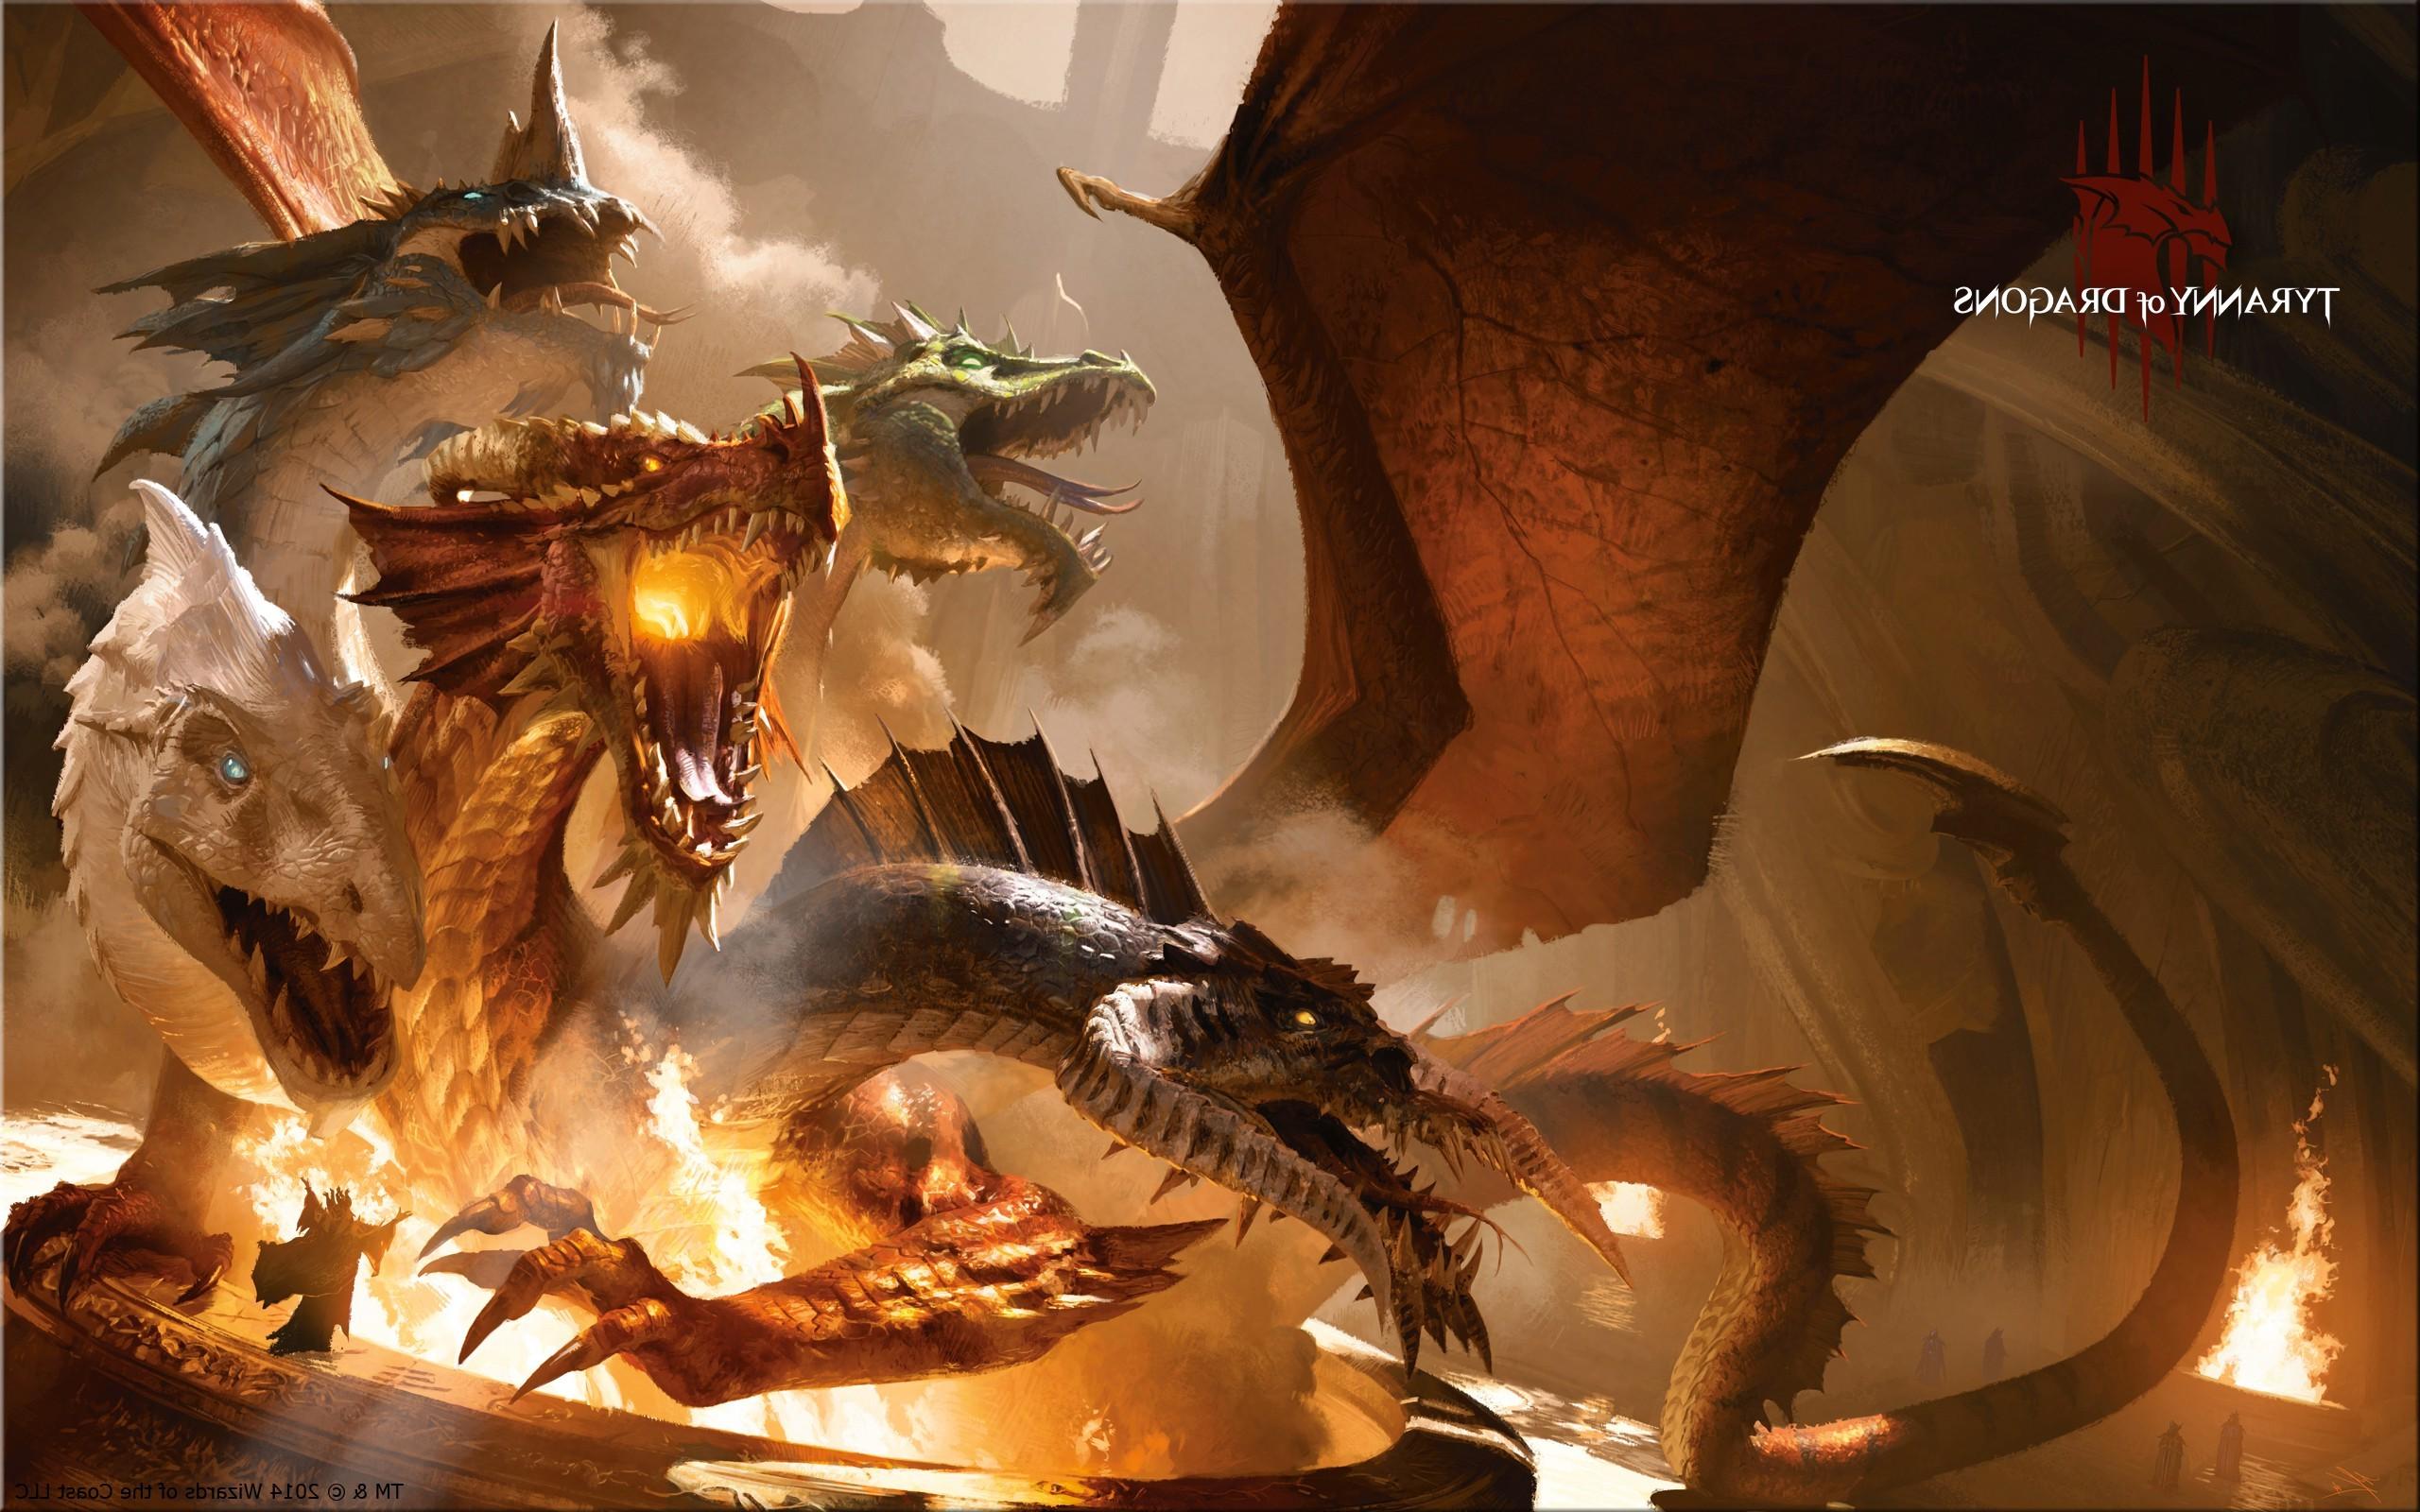 Fantasy Art Artwork Dragon Mythology Tiamat Dungeons And Dragons Screenshot 2560x1600 Px